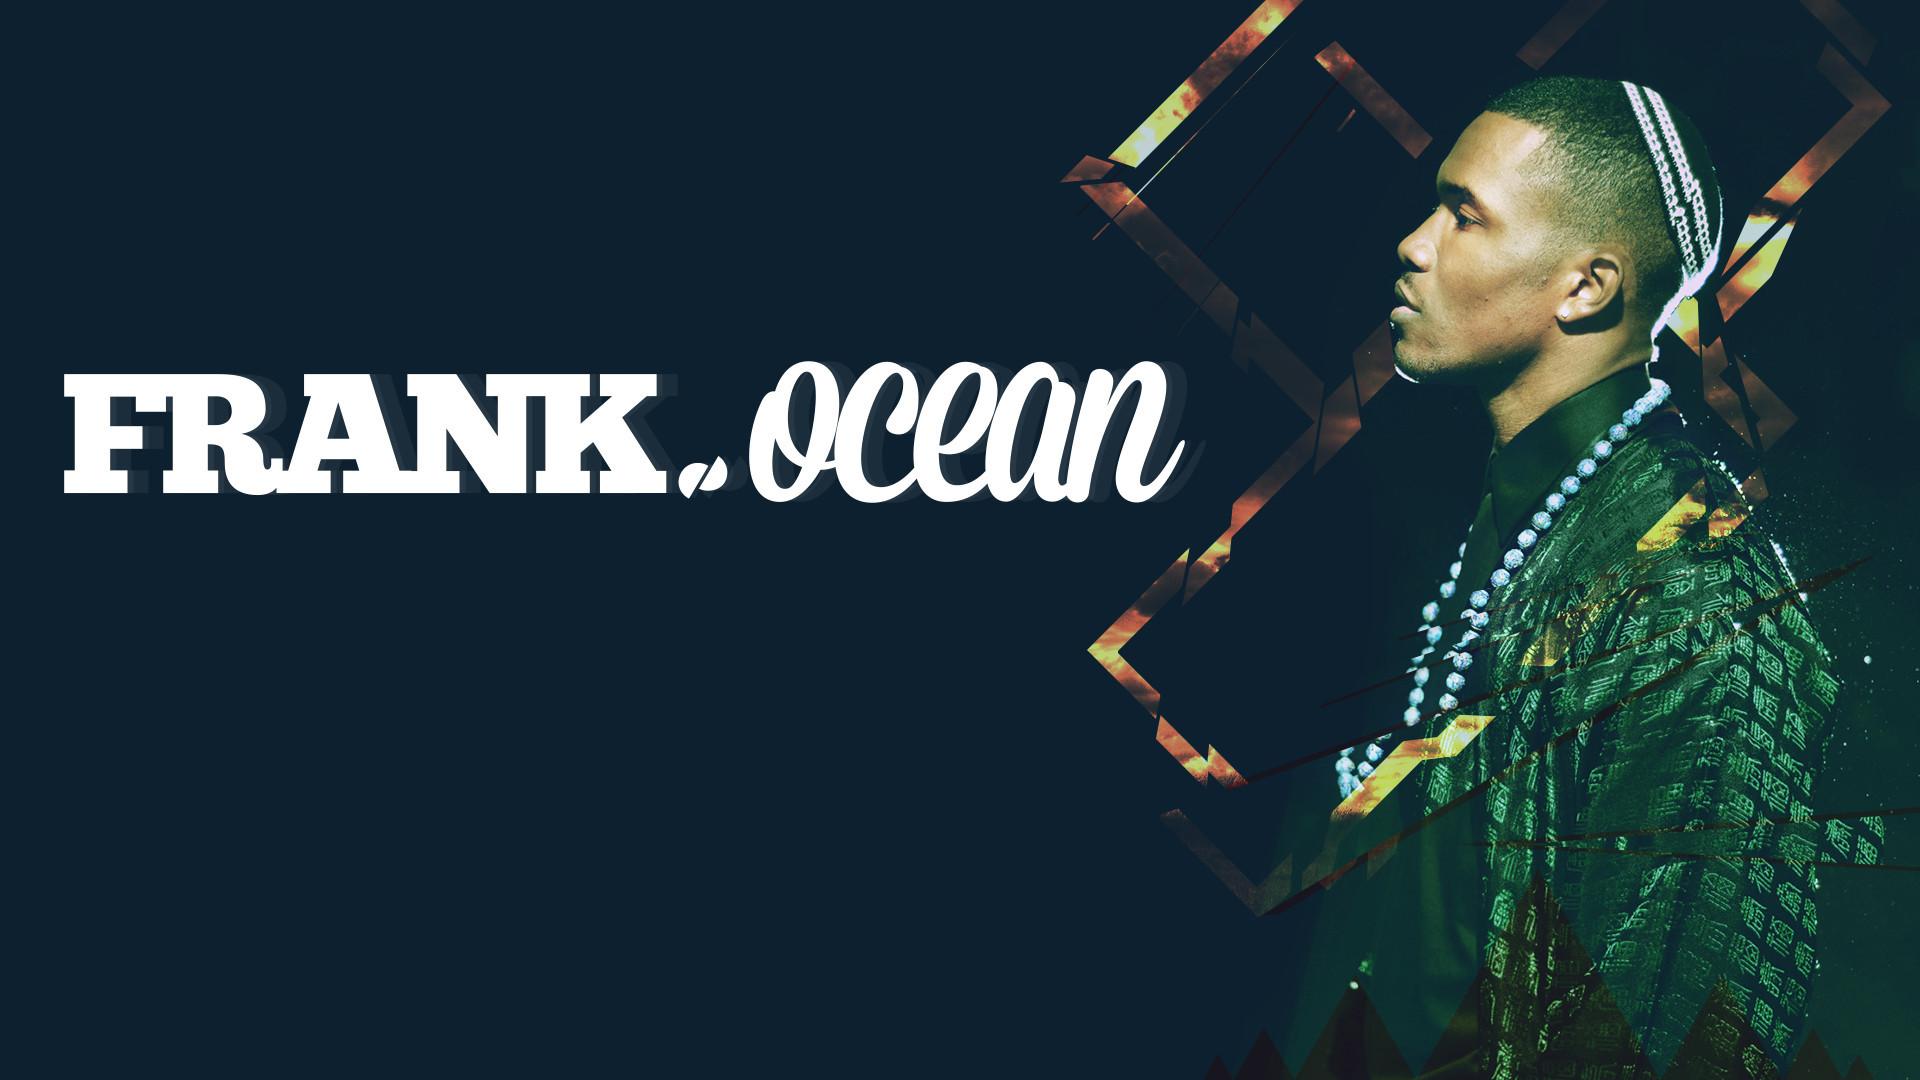 Frank Ocean Wallpapers HD